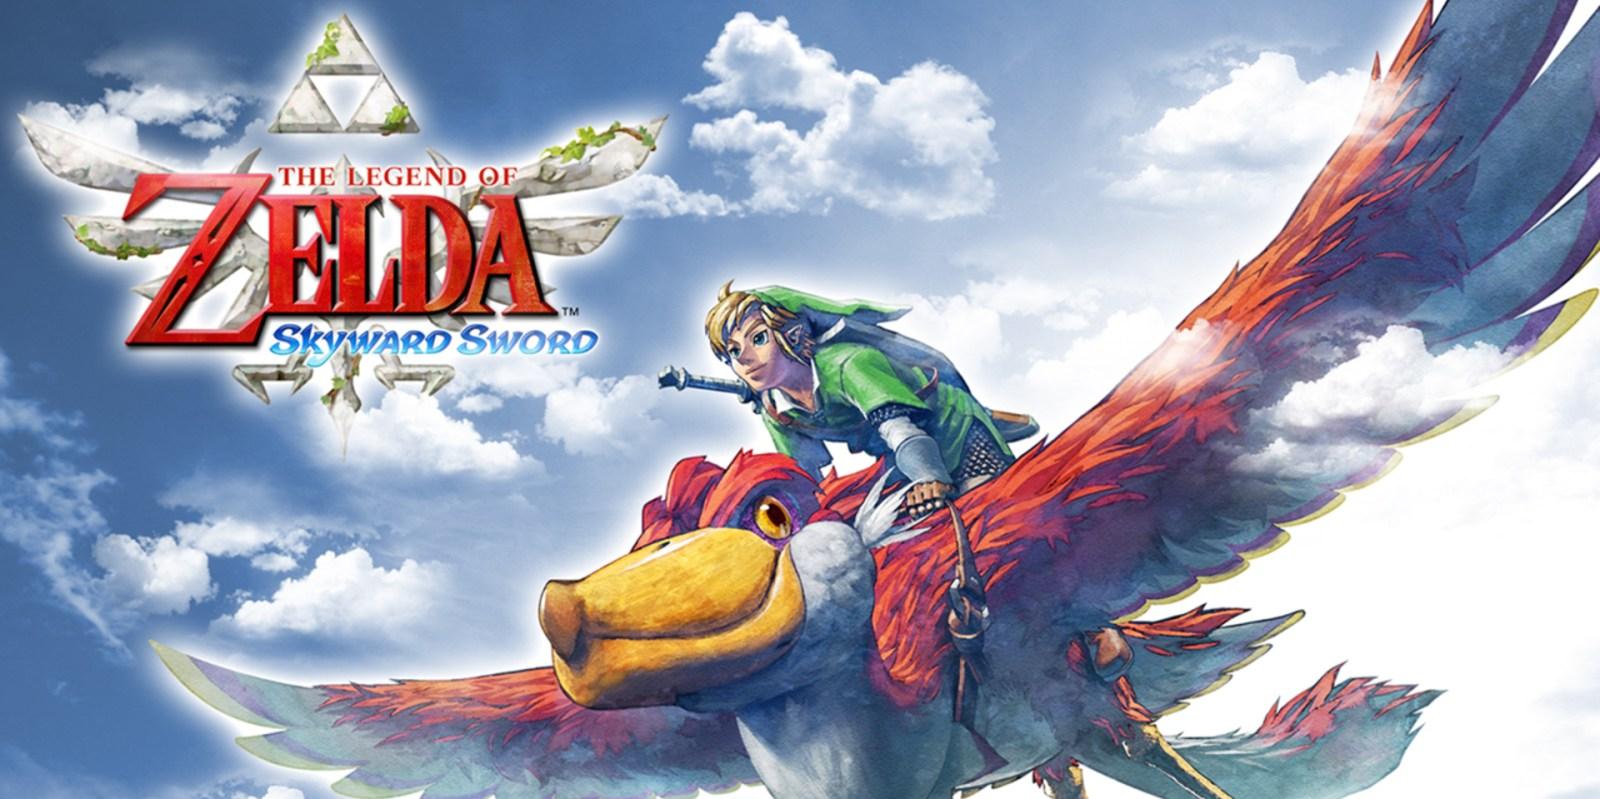 Games/Apps: Legend of Zelda Skyward Sword $40, 1TB Madden Xbox One + 50″ Samsung HDTV $850, freebies, more